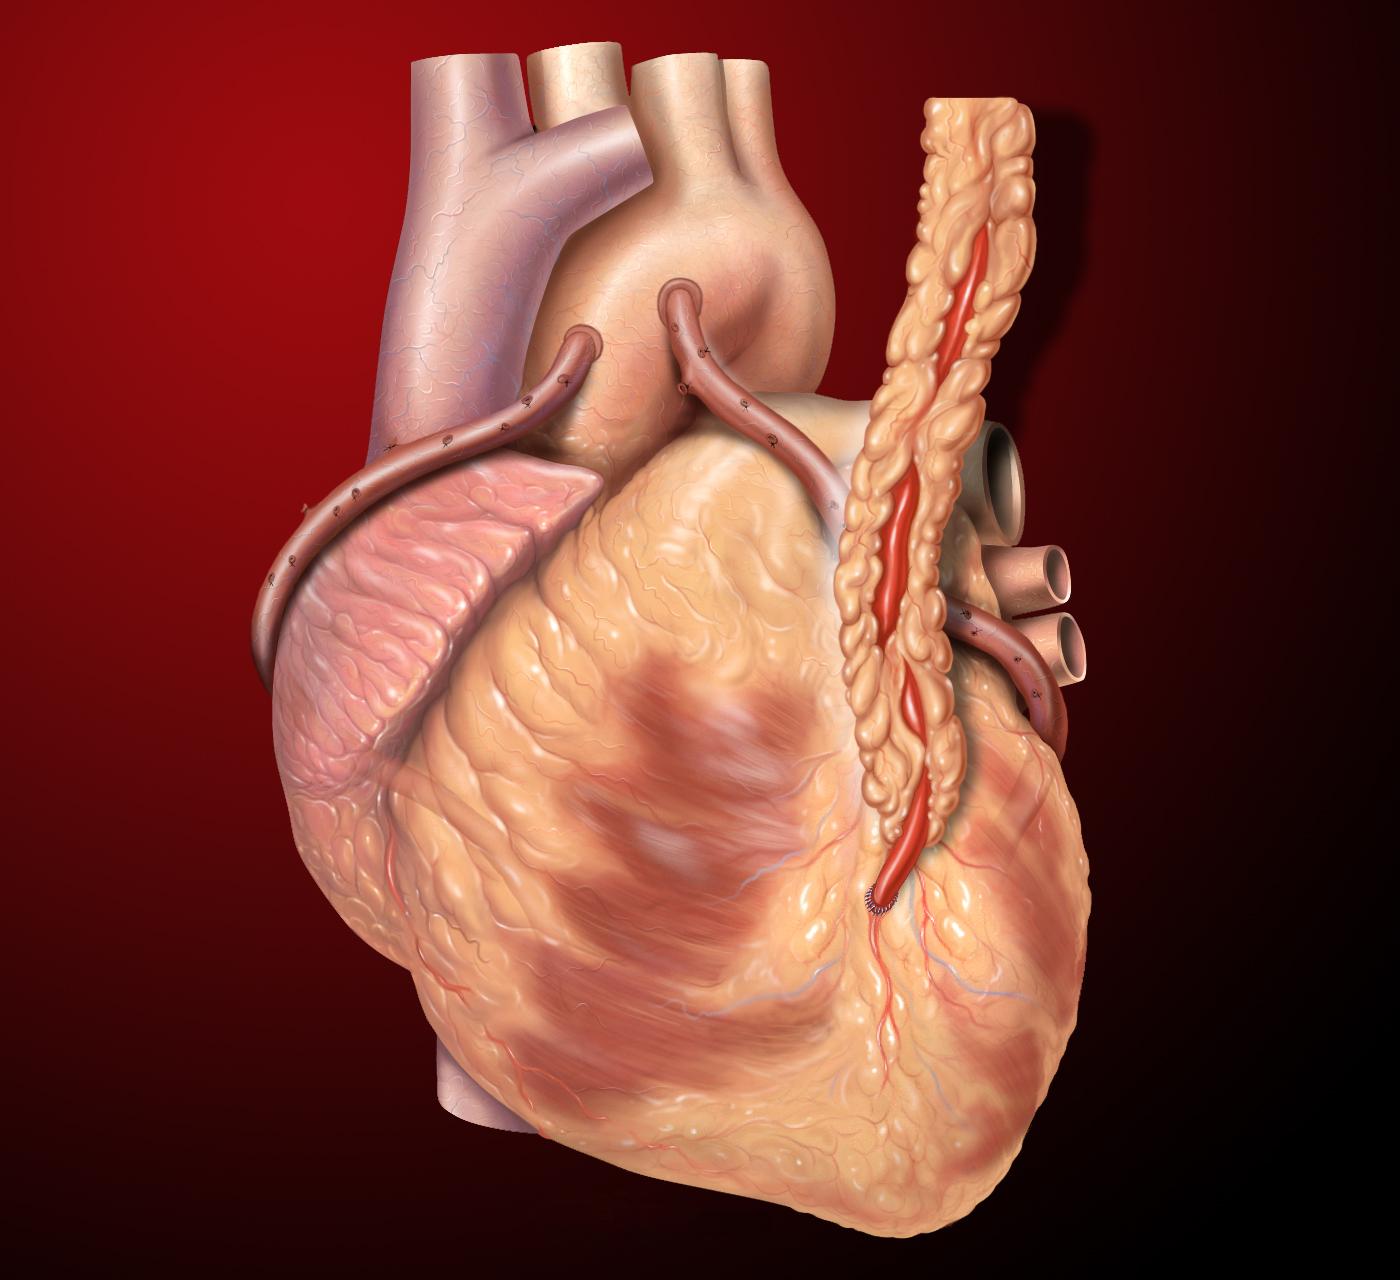 File:Heart saphenous coronary grafts.jpg - Wikimedia Commons